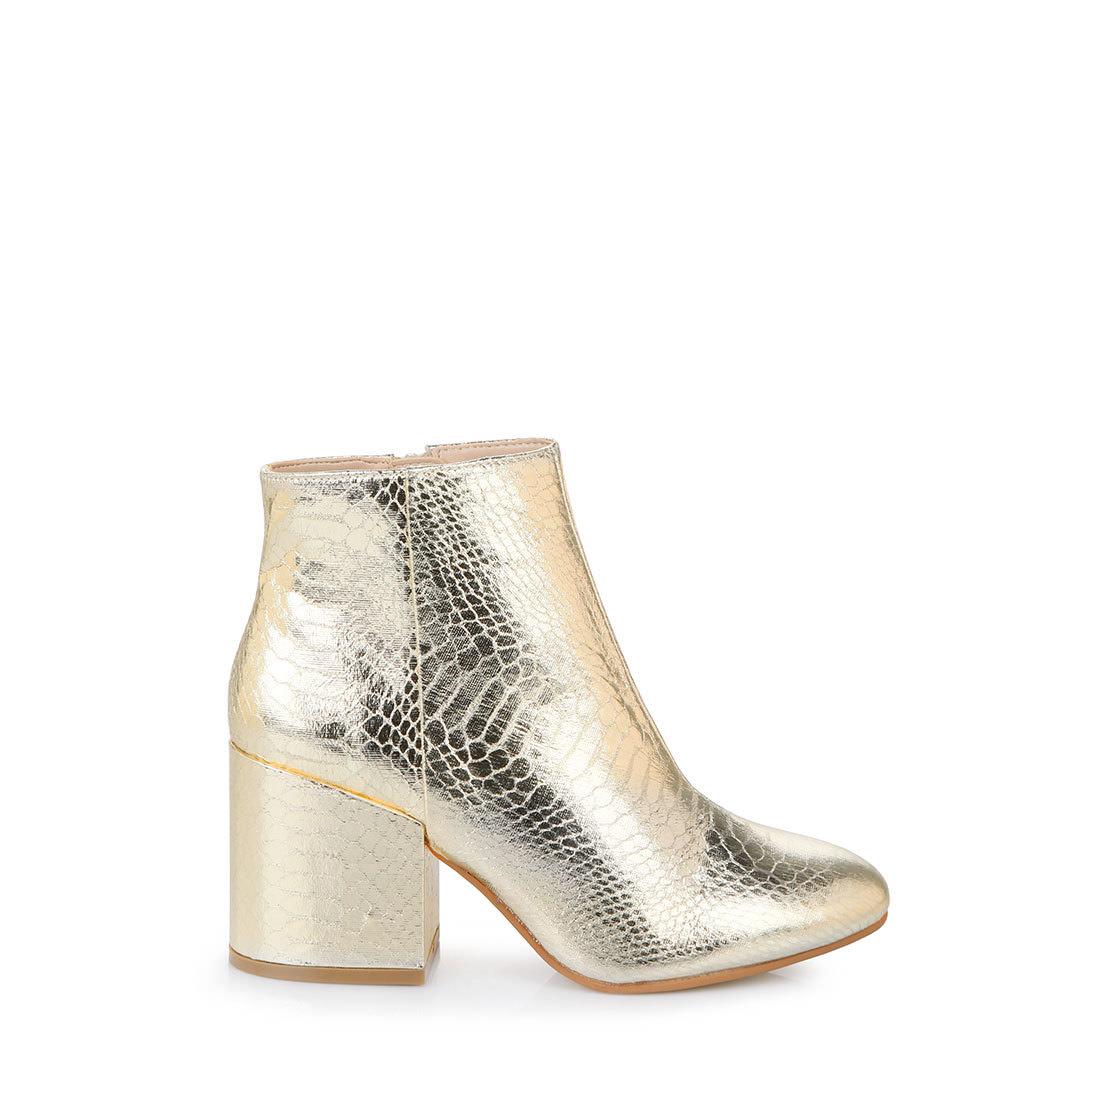 buffalo ankle boots in gold buy online in buffalo online shop buffalo. Black Bedroom Furniture Sets. Home Design Ideas